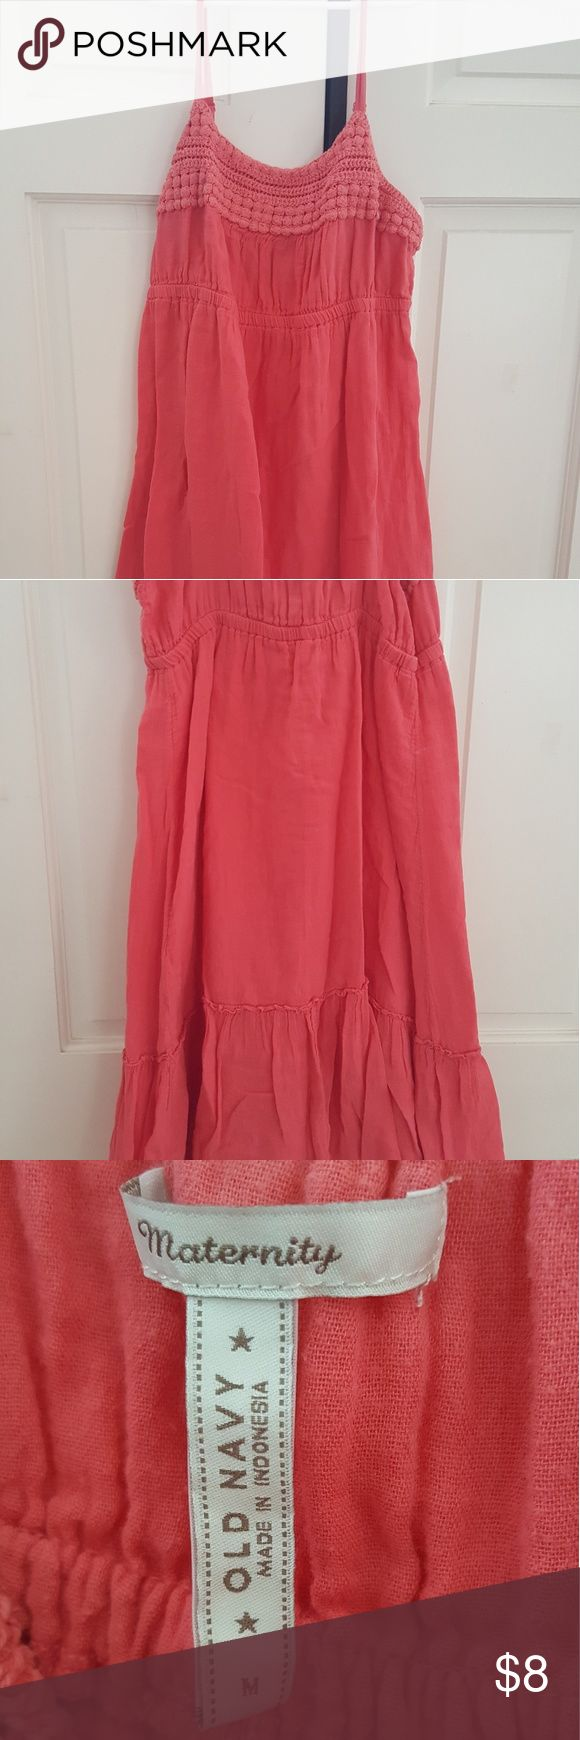 Maternity dress Used Spagetti strap maternity dress, knee length. Old navy maternity. Old Navy Dresses